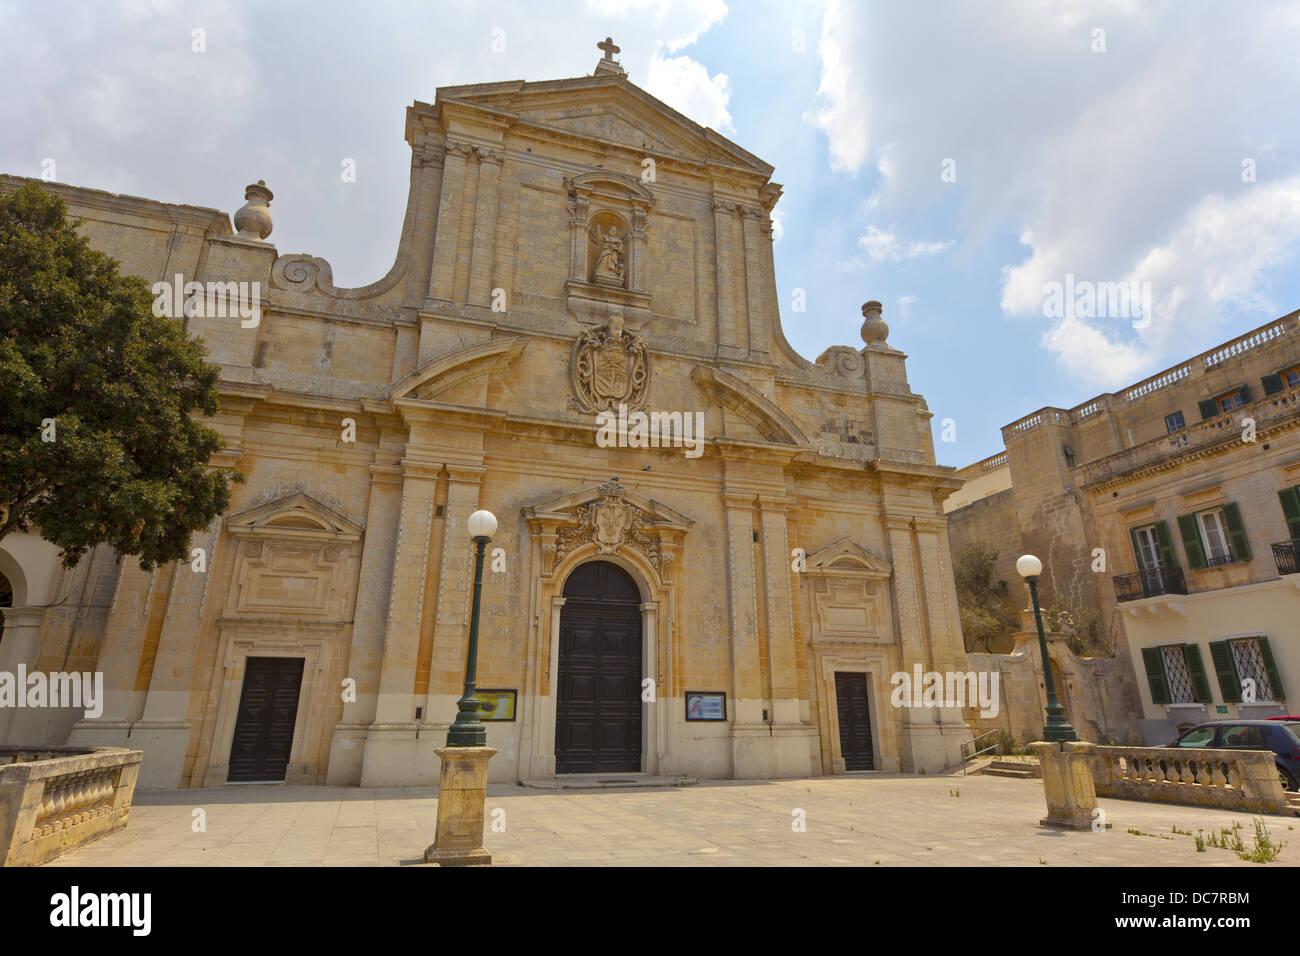 Historische katholische Kirche des Heiligen Dominikus in Rabat, Malta. Stockbild